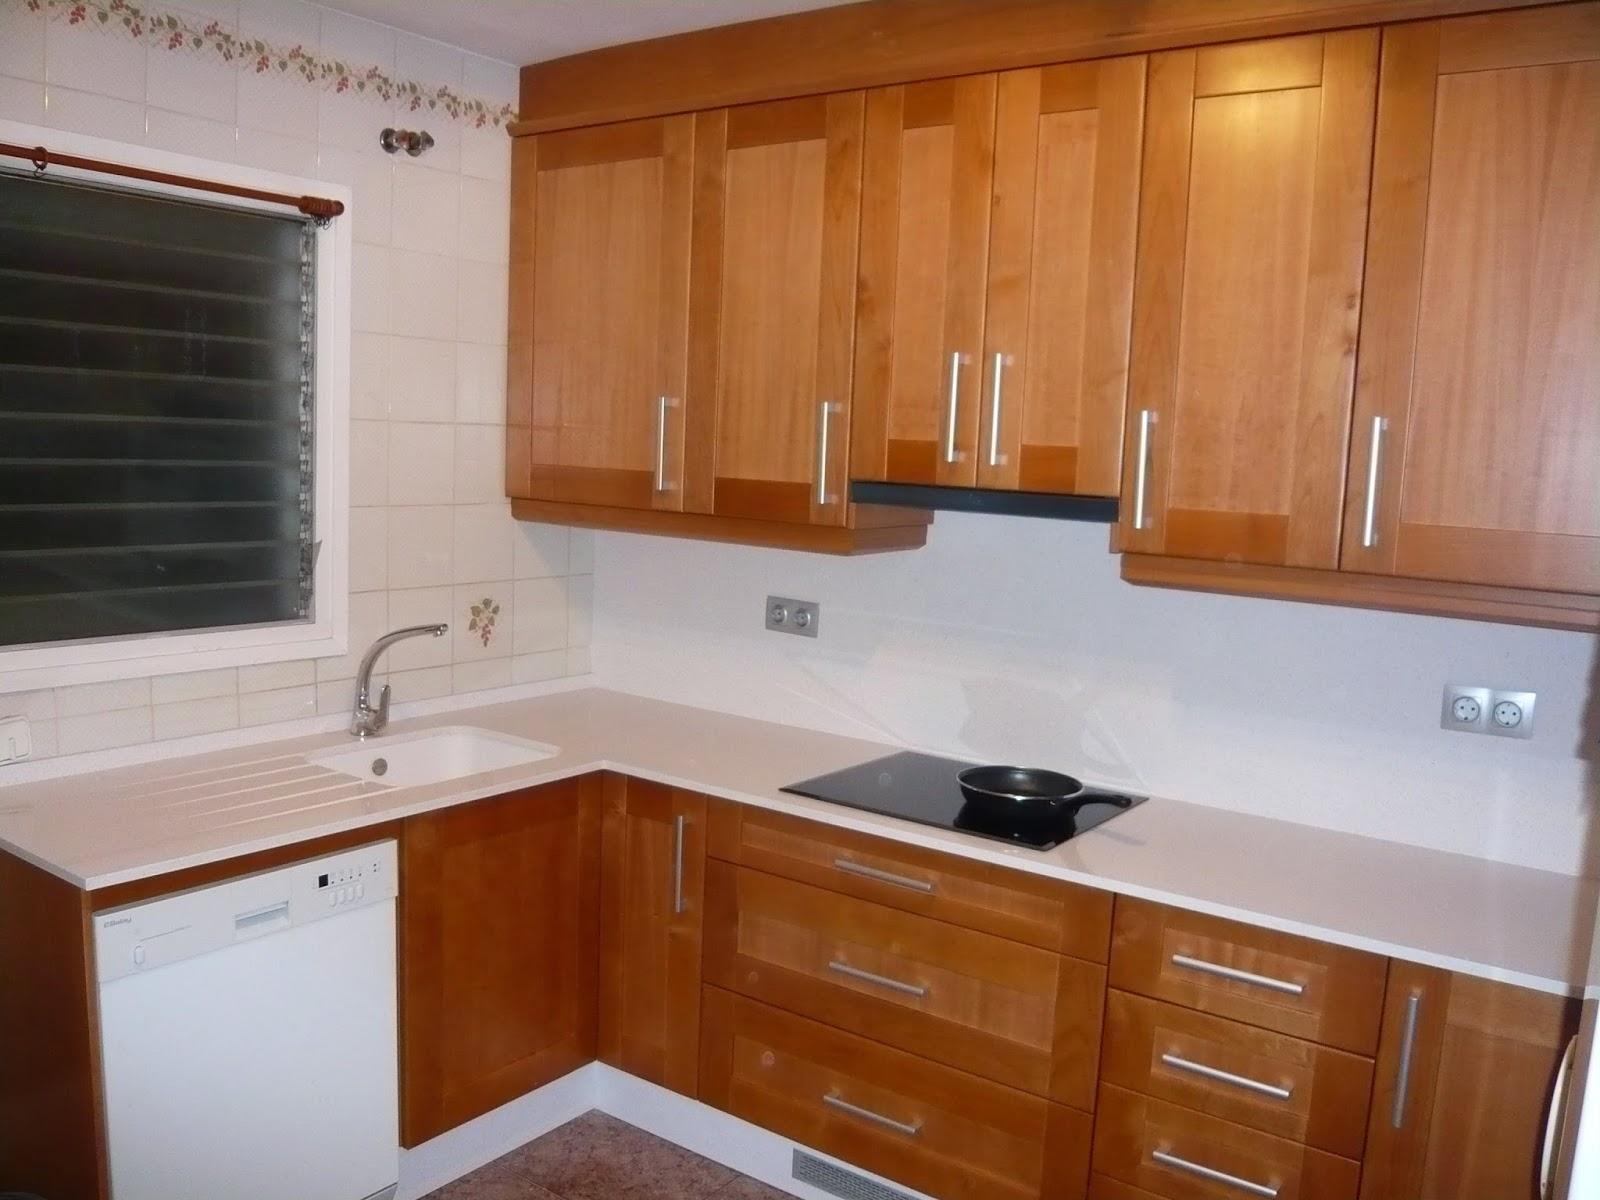 Reuscuina muebles de cocina con puertas macizas - Puertas muebles de cocina ...